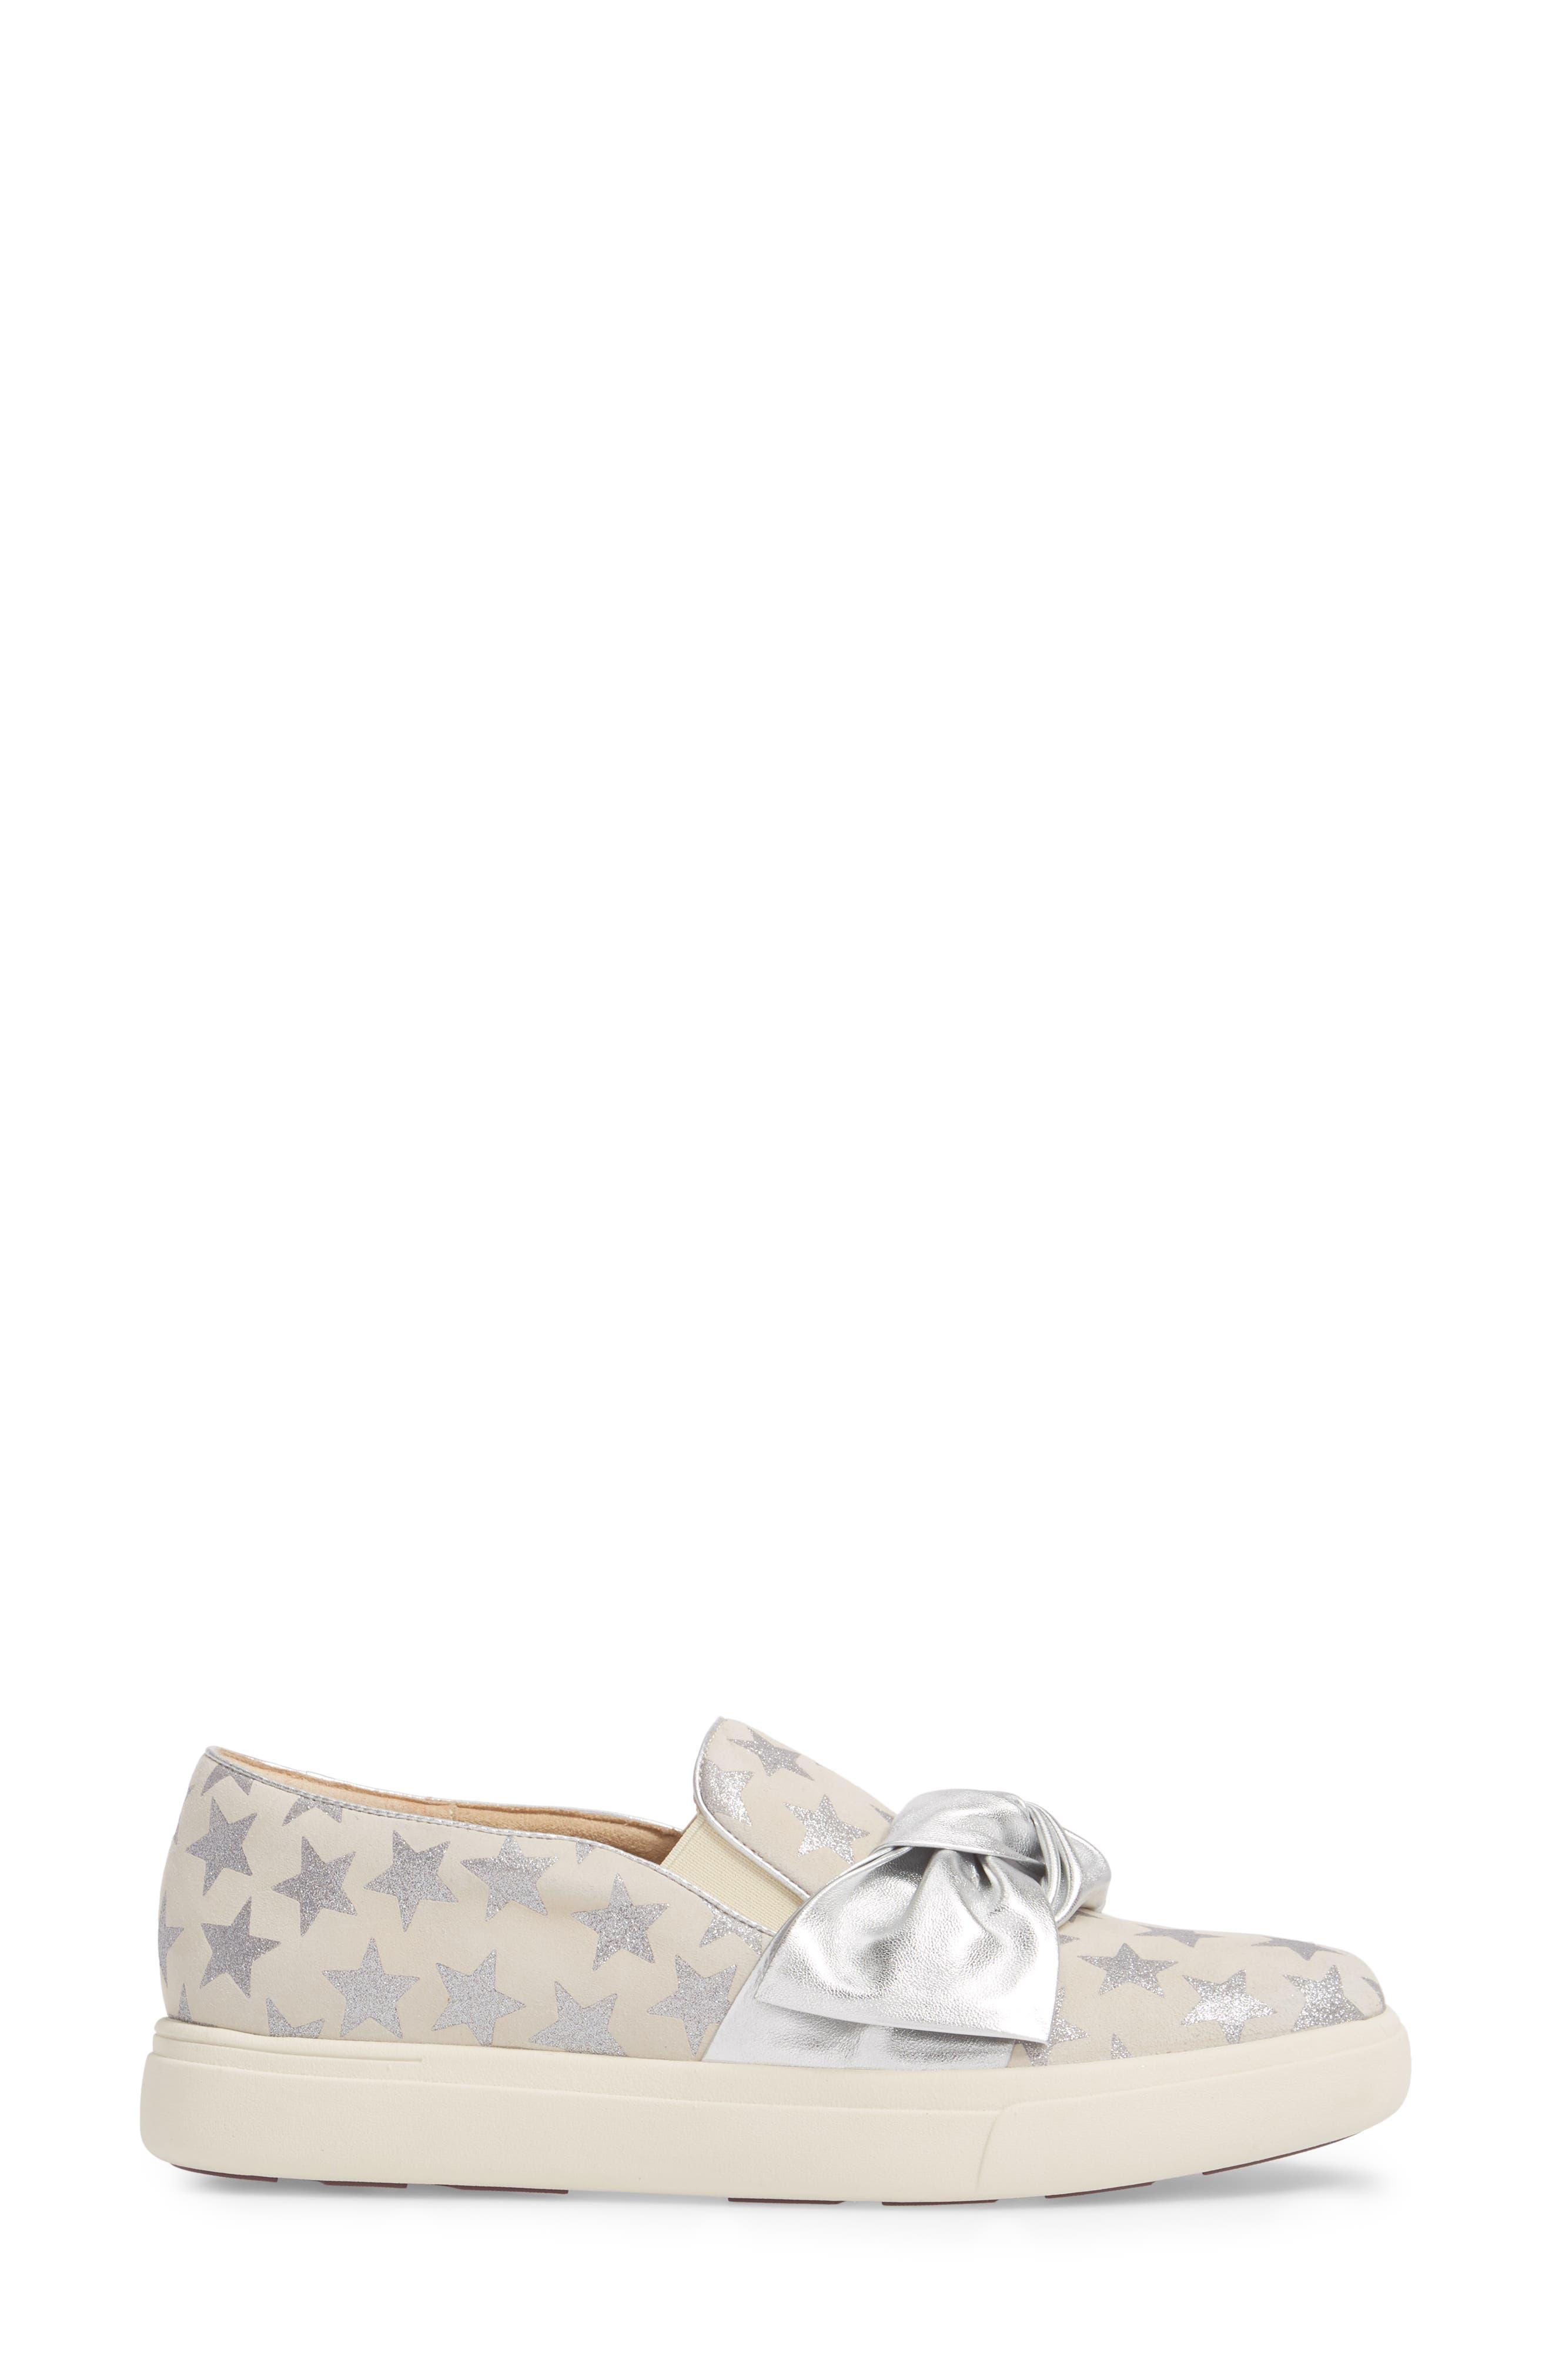 Odelet Slip-On Sneaker,                             Alternate thumbnail 3, color,                             Beige/ Silver Suede